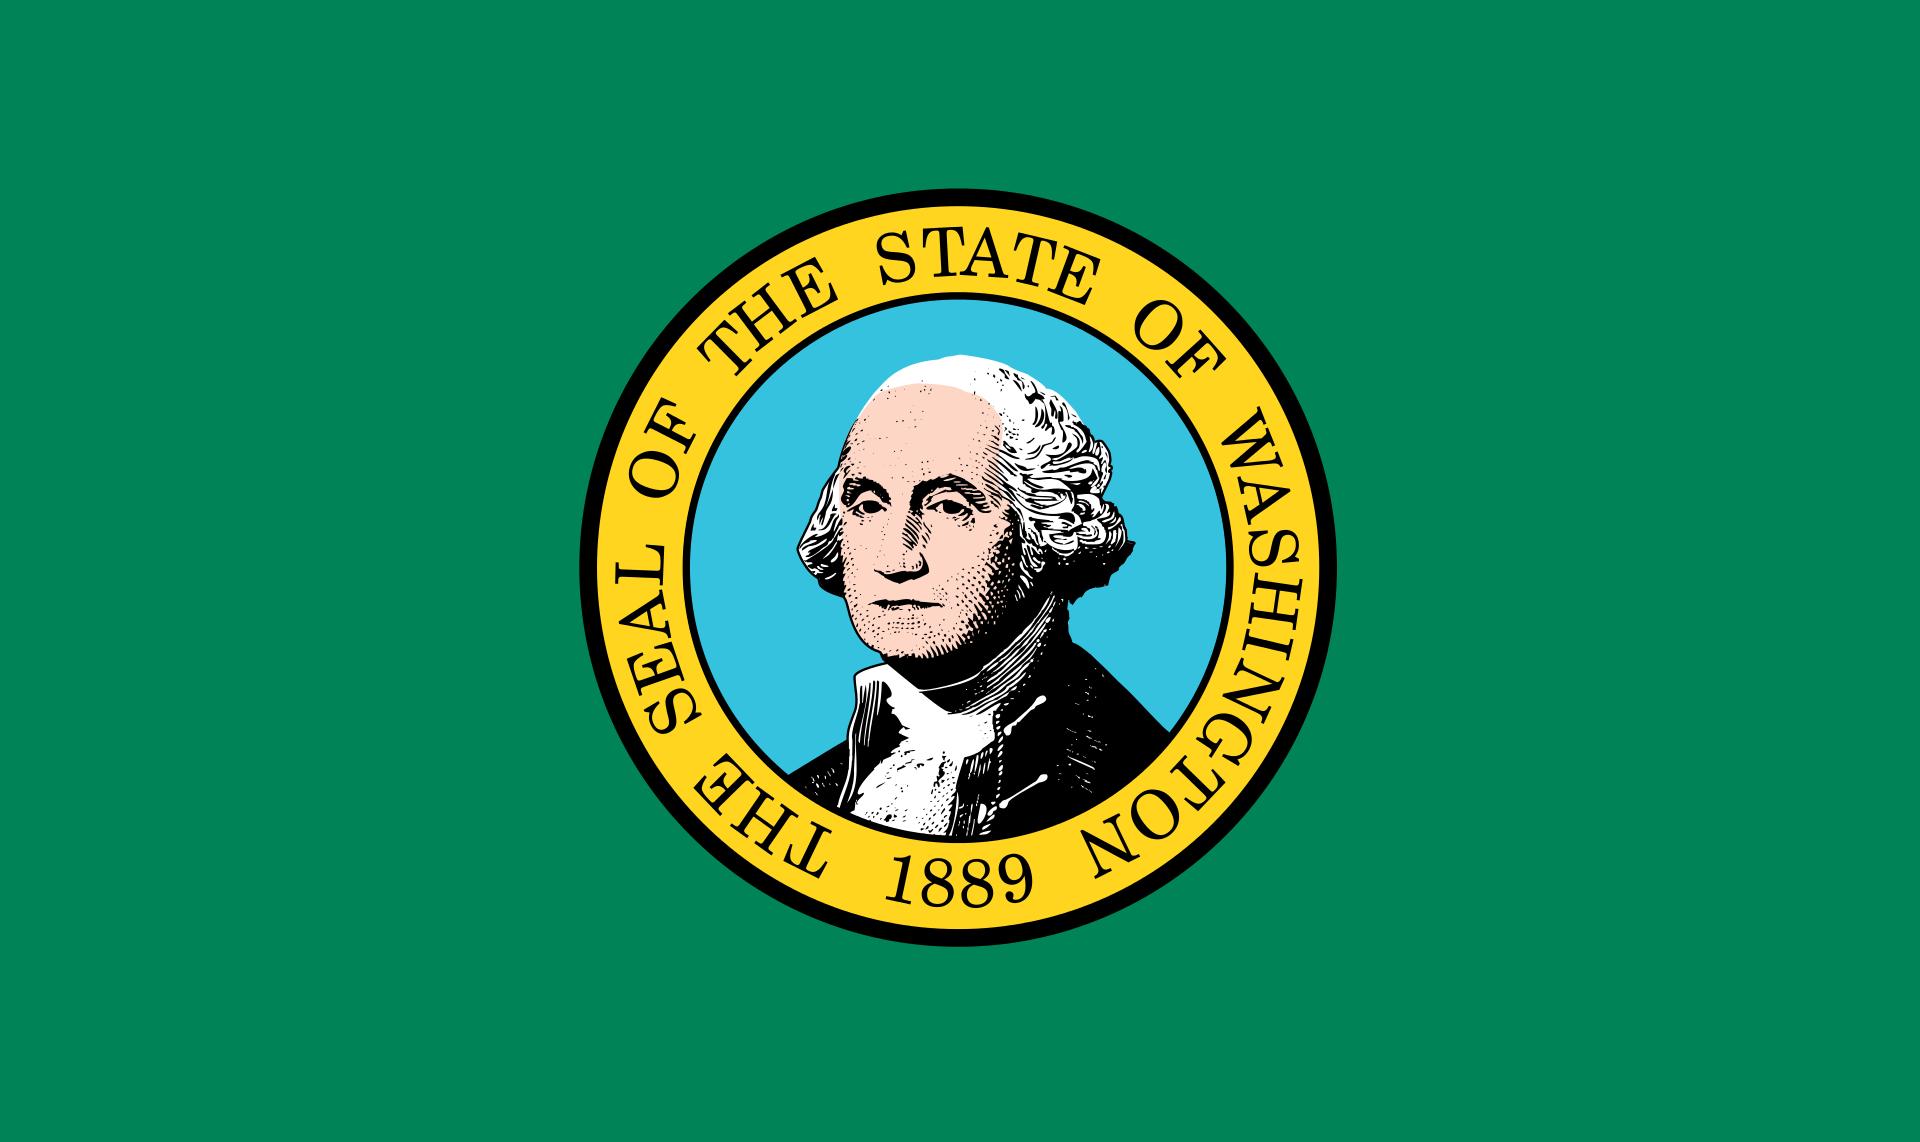 Best English Springer Spaniel Breeders in Washington (WA